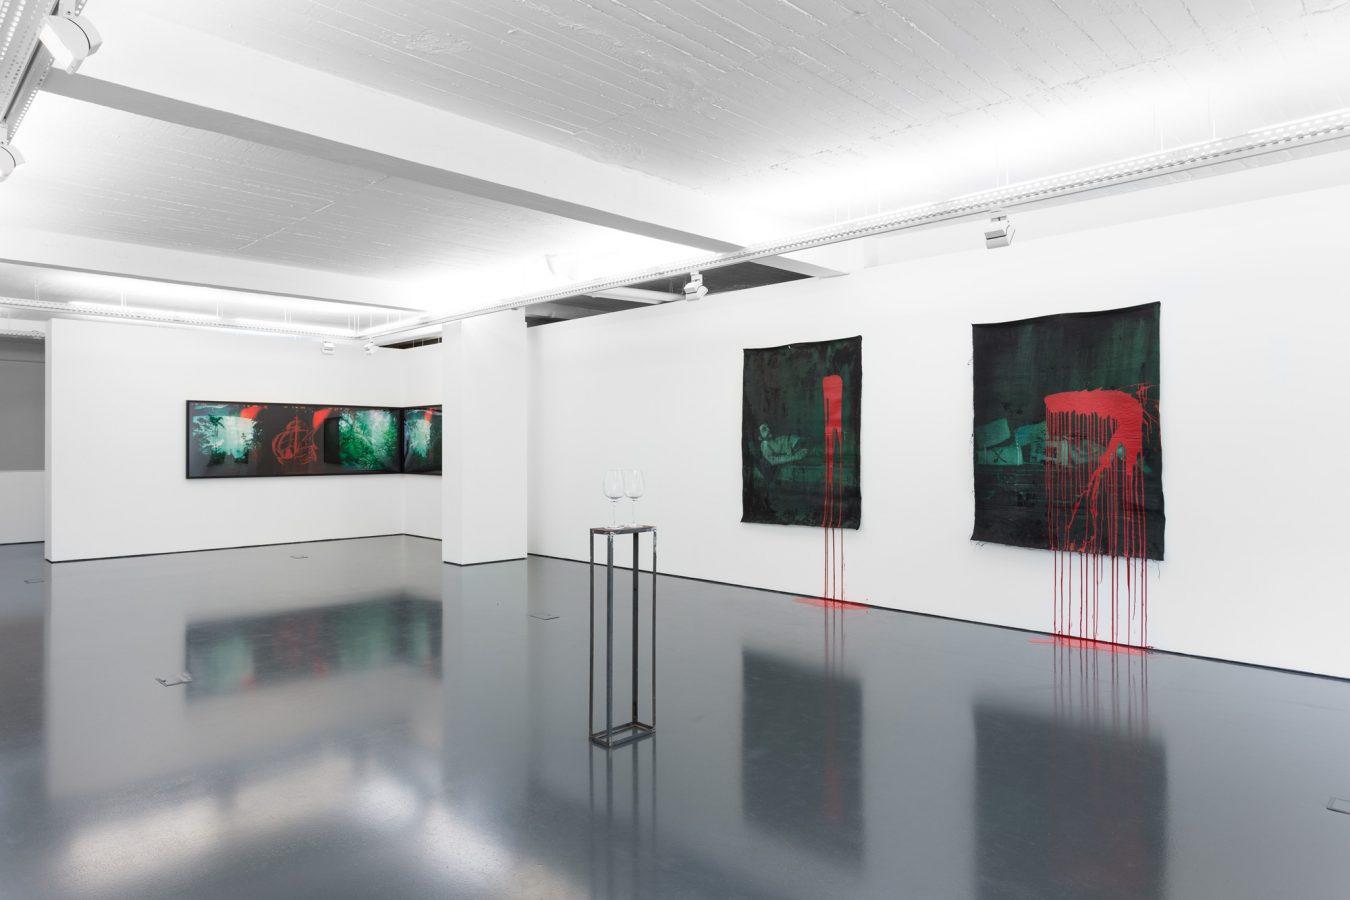 Galeria Pedro Cera – Dora Longo Bahia - Felix Culpa